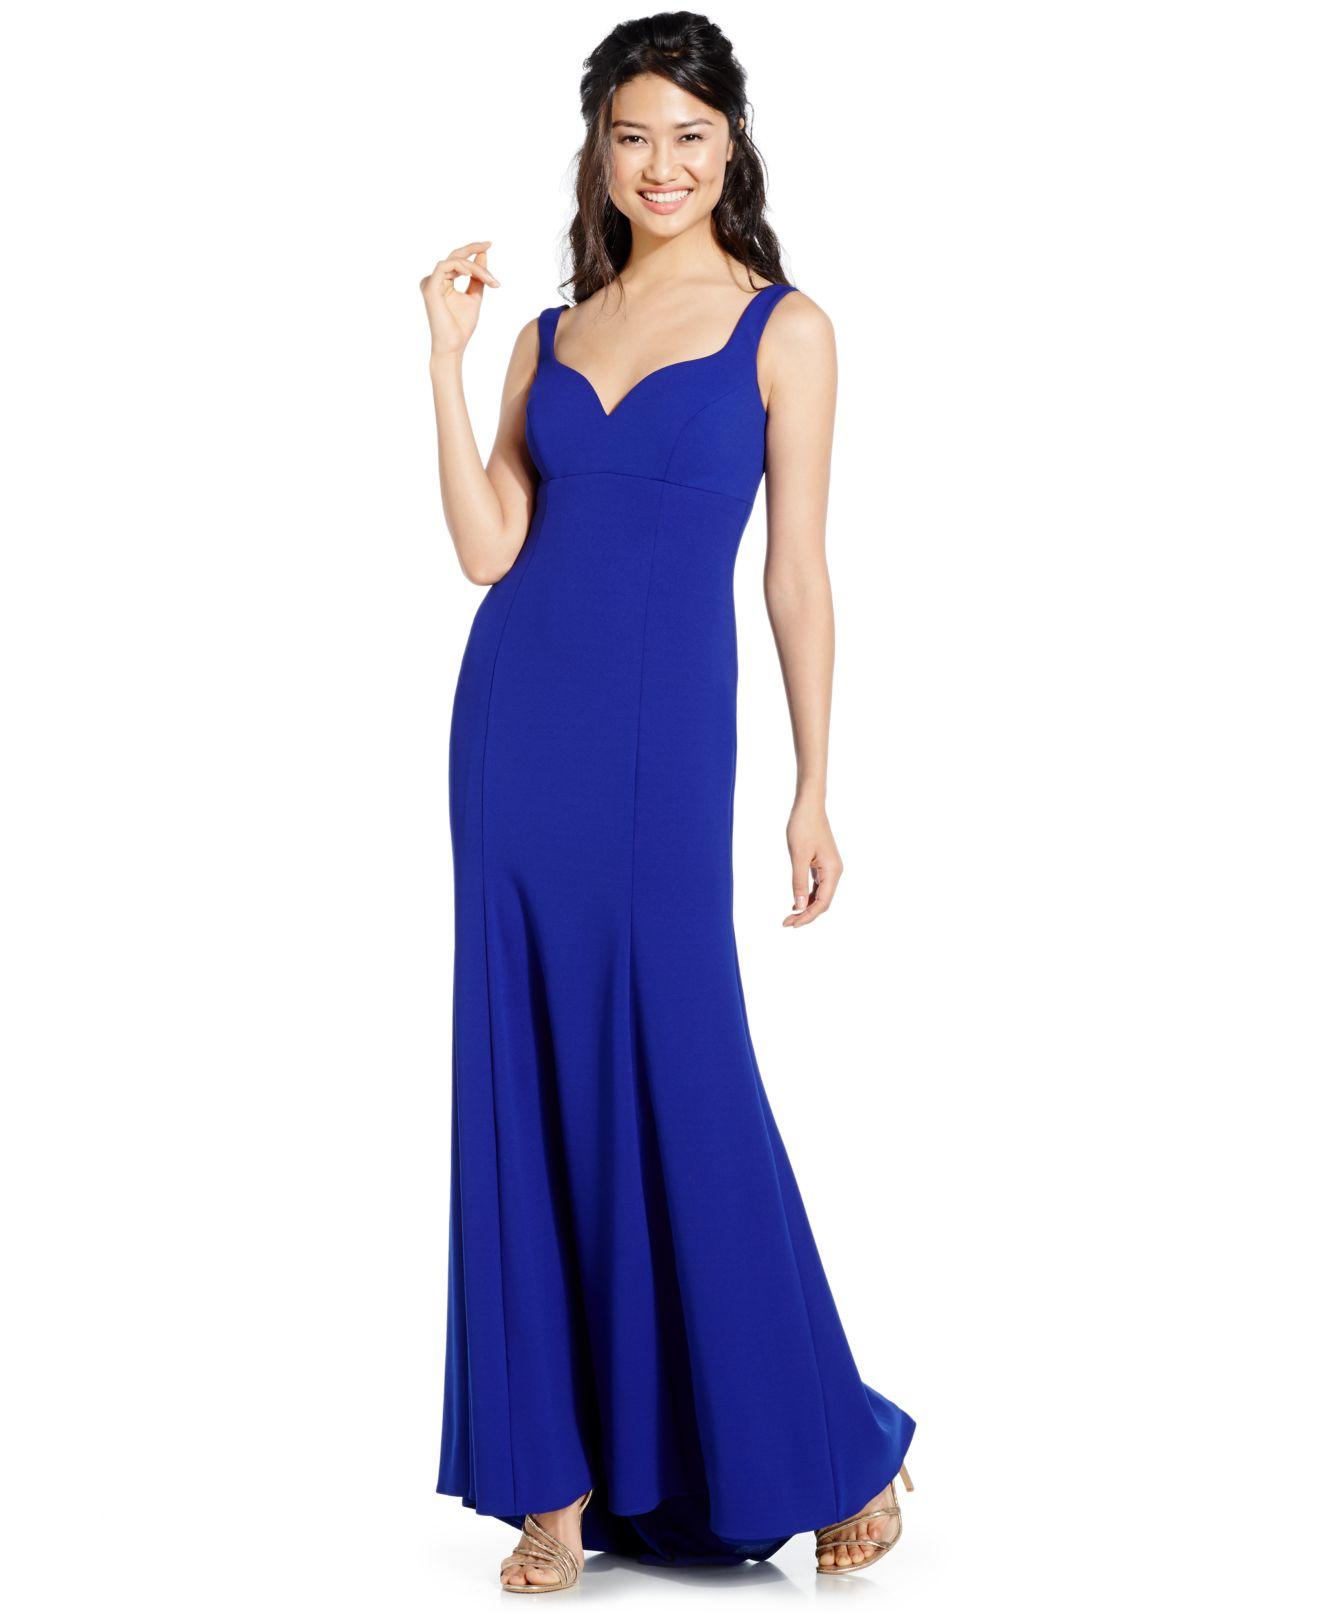 Lyst - Xscape Sleeveless Gown in Purple